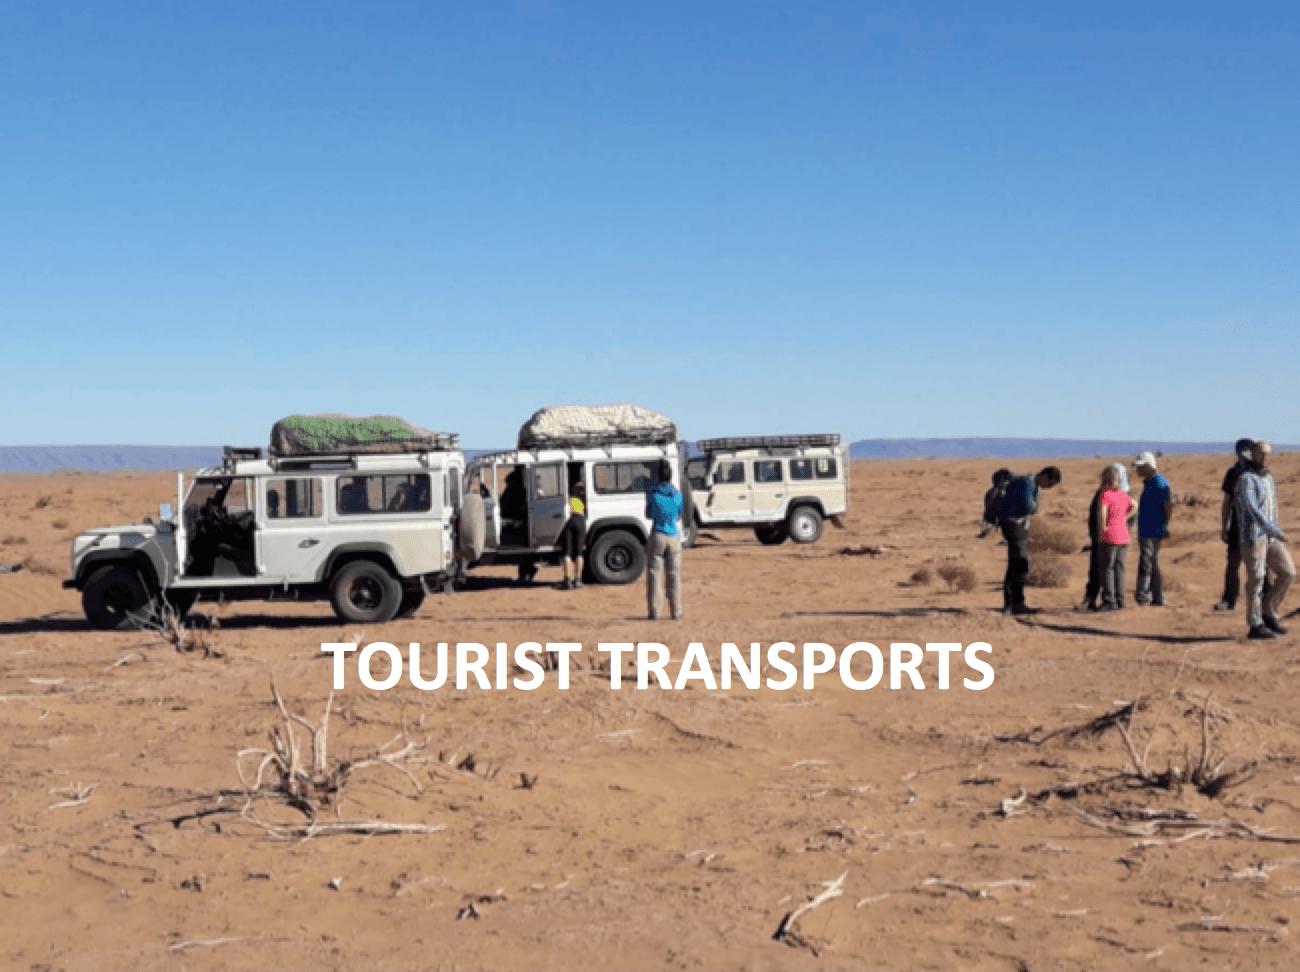 TRANSPORTS TOURISTIQUES - AGADIR